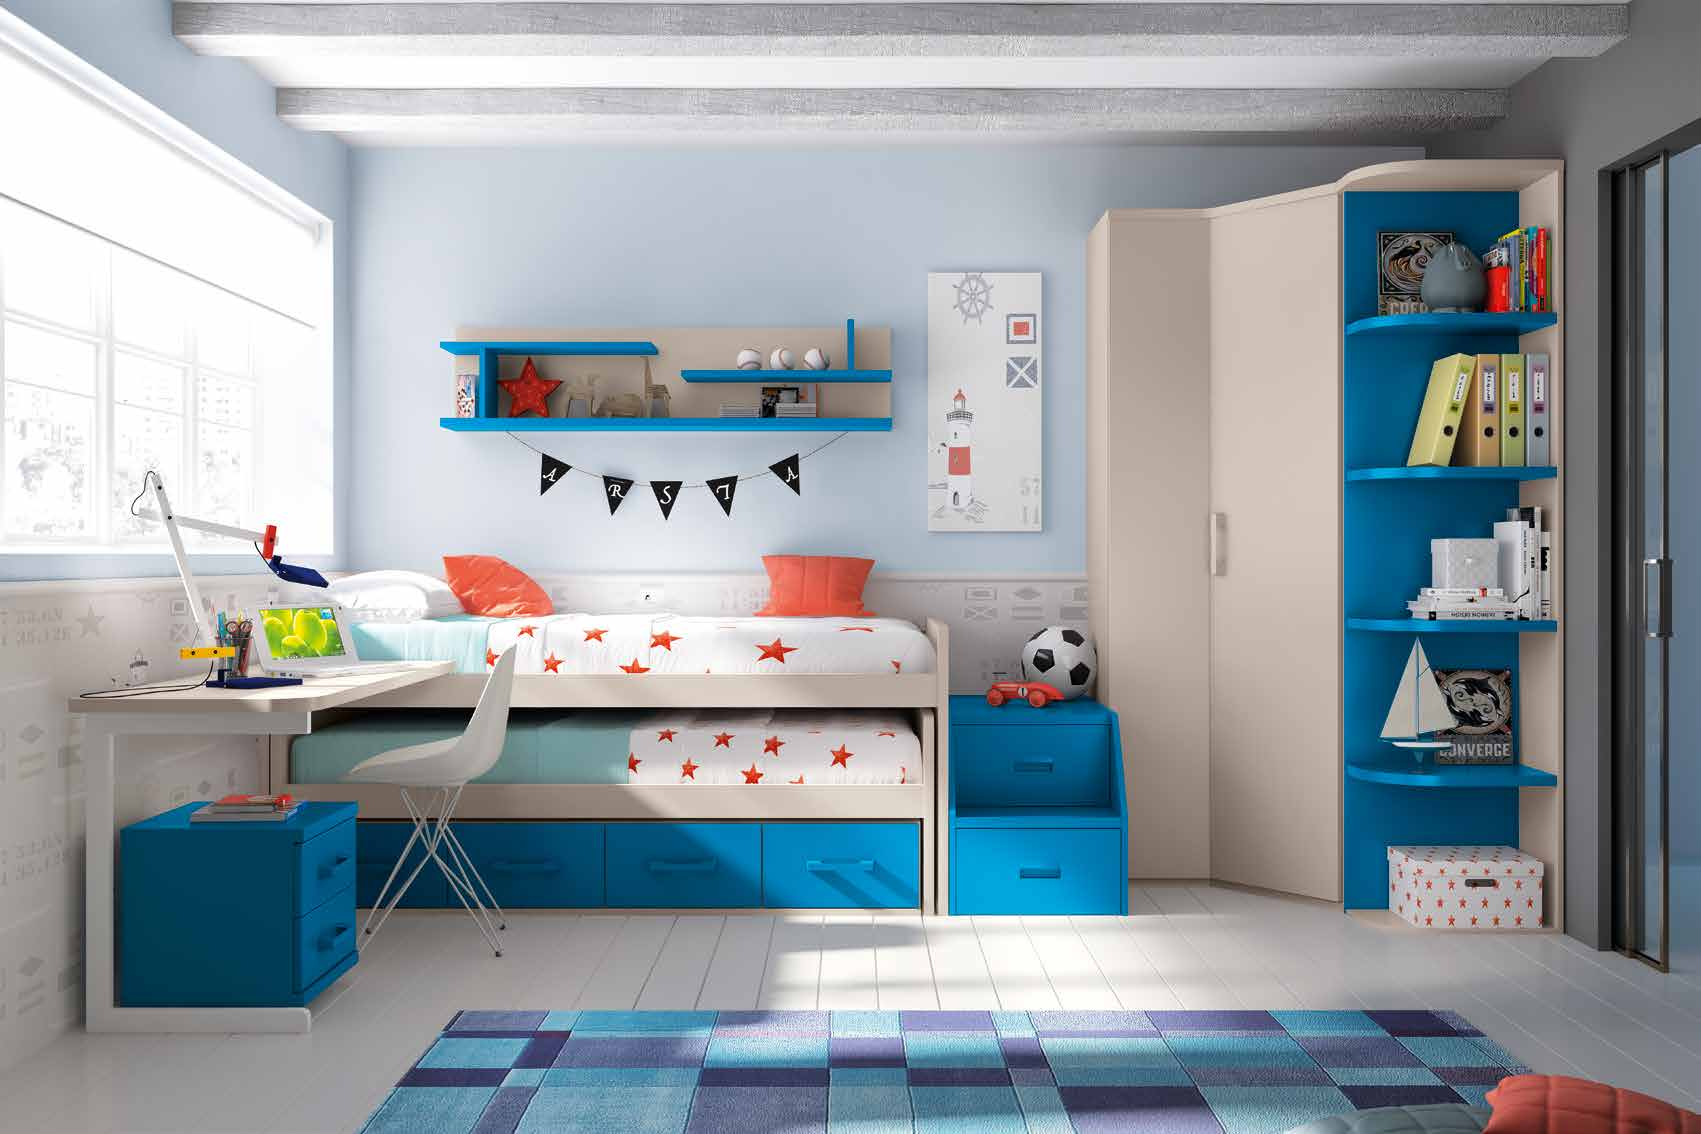 Im genes de habitaciones infantiles im genes - Habitaciones infantiles decoracion paredes ...